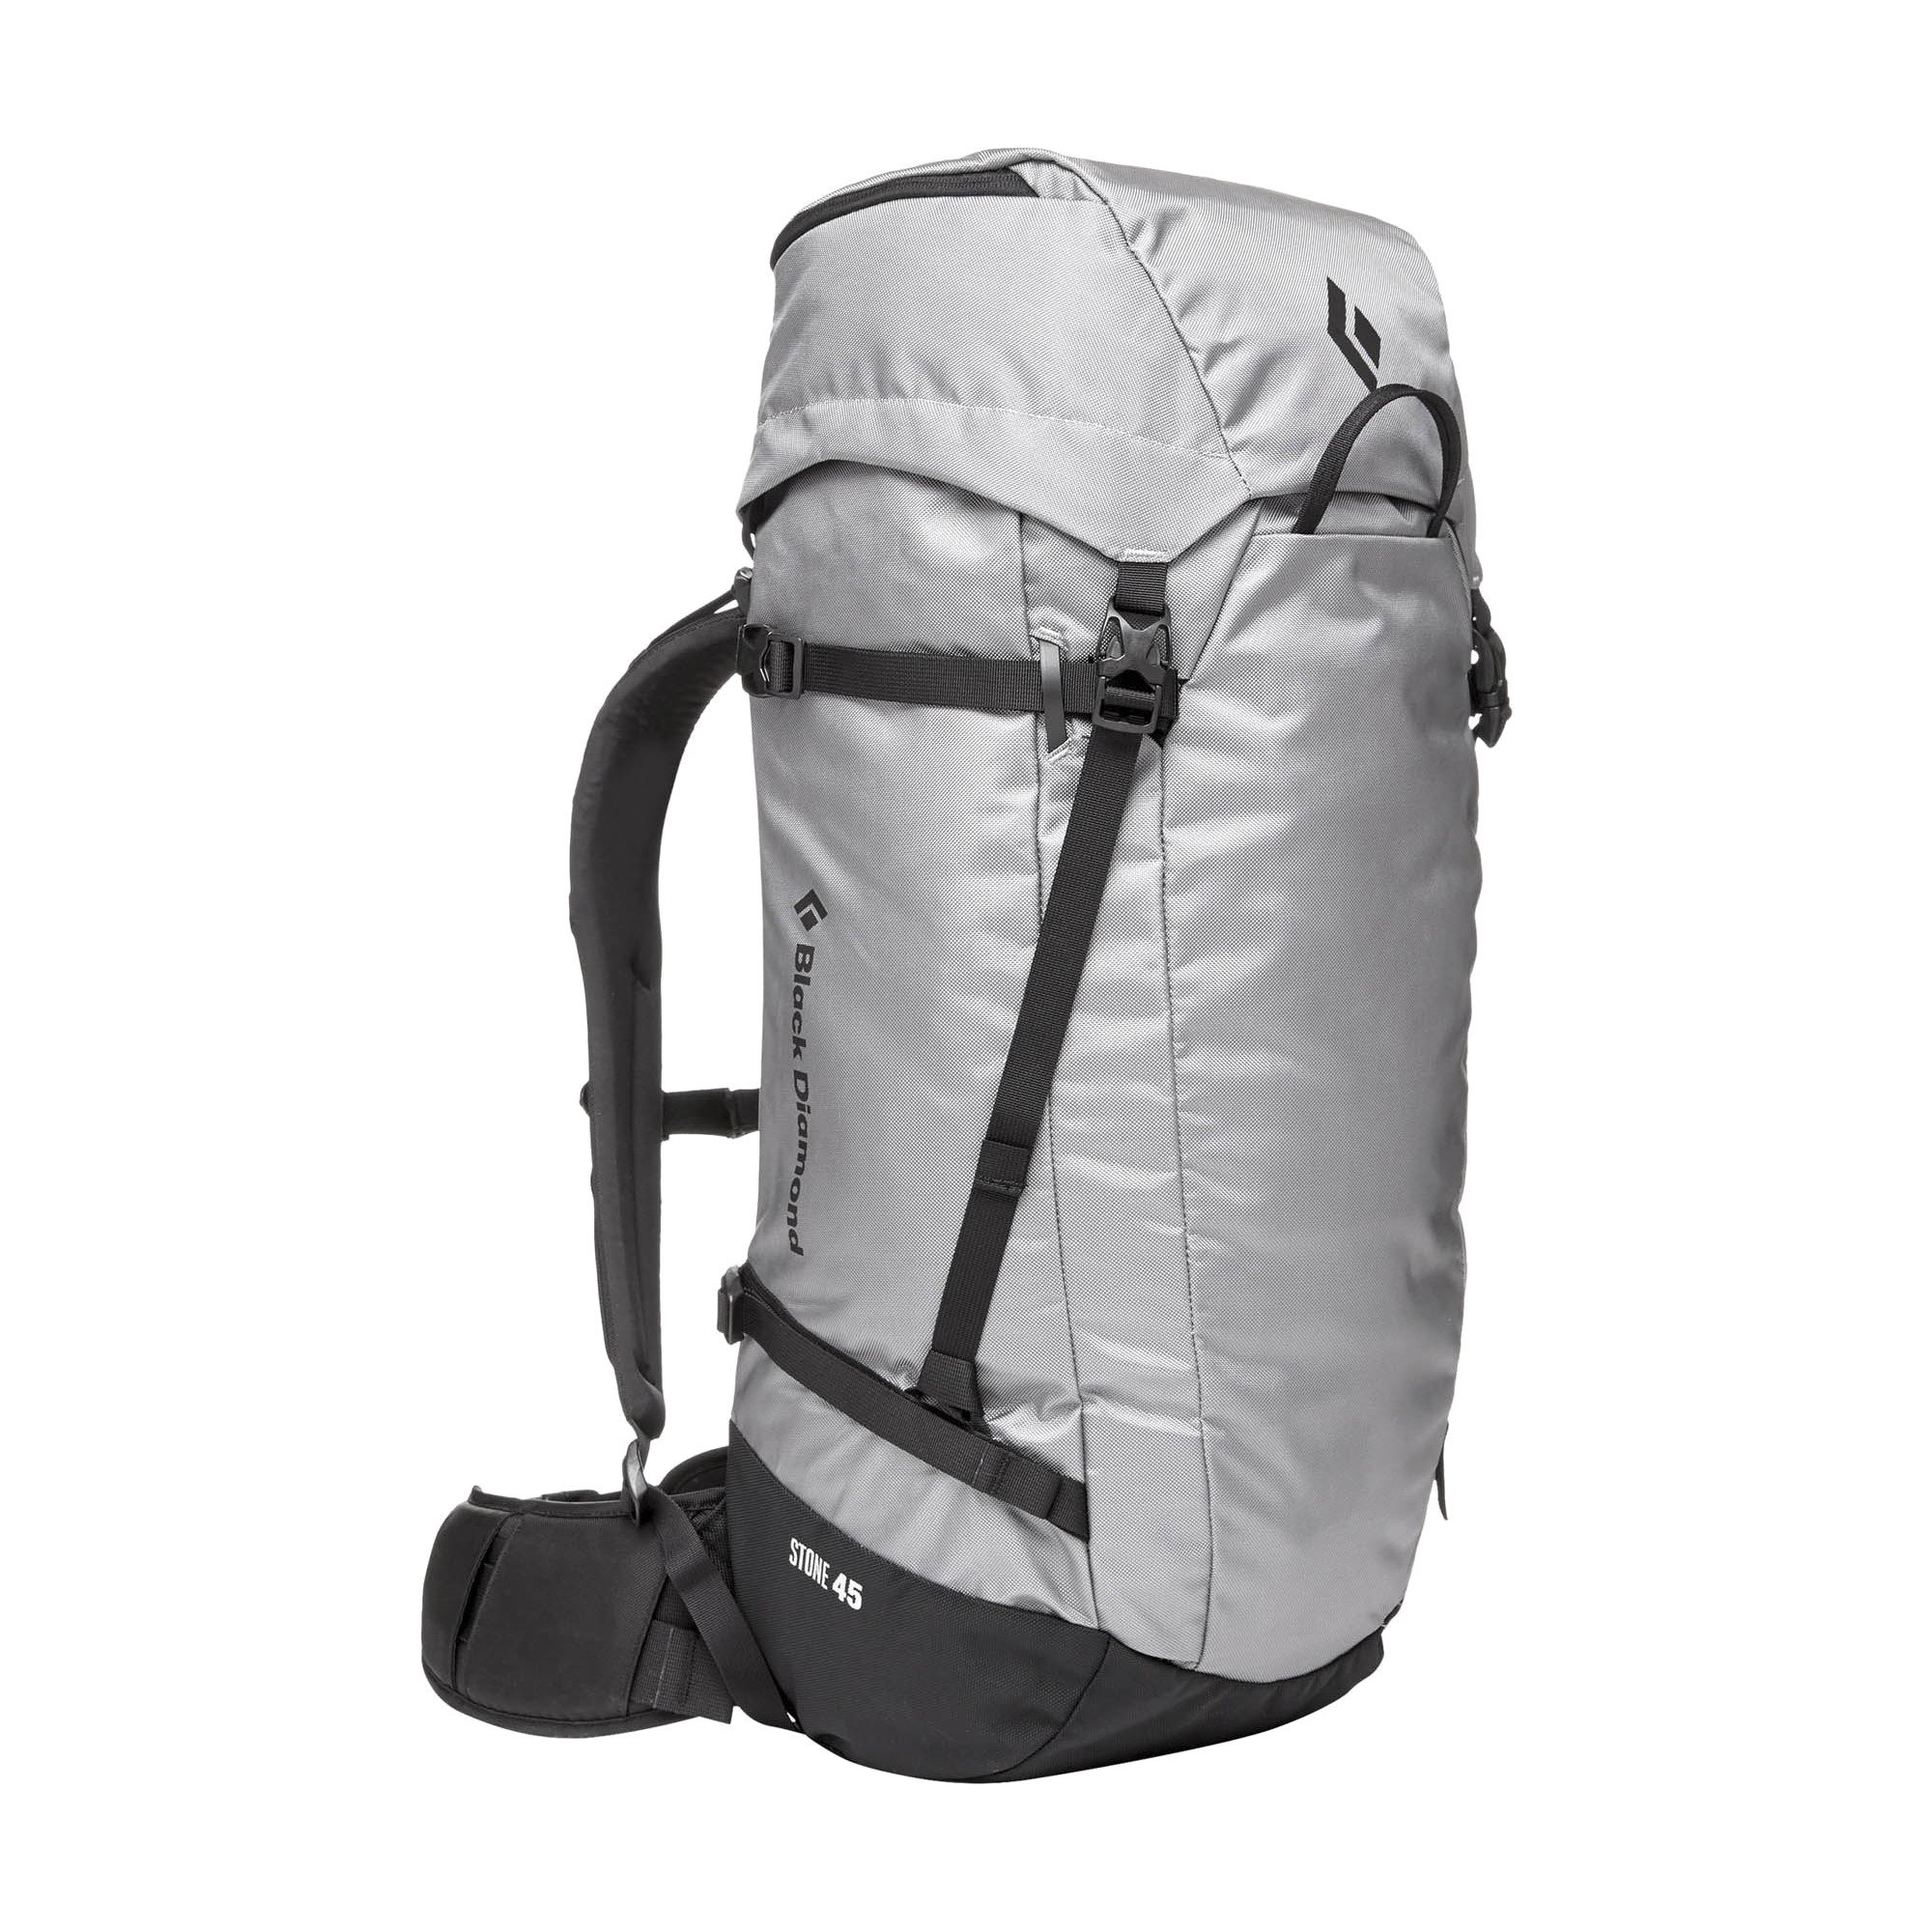 a59484564ce9e Plecak STONE 45 nickel | podróże i trekking \ plecaki \ średnie 35 ...